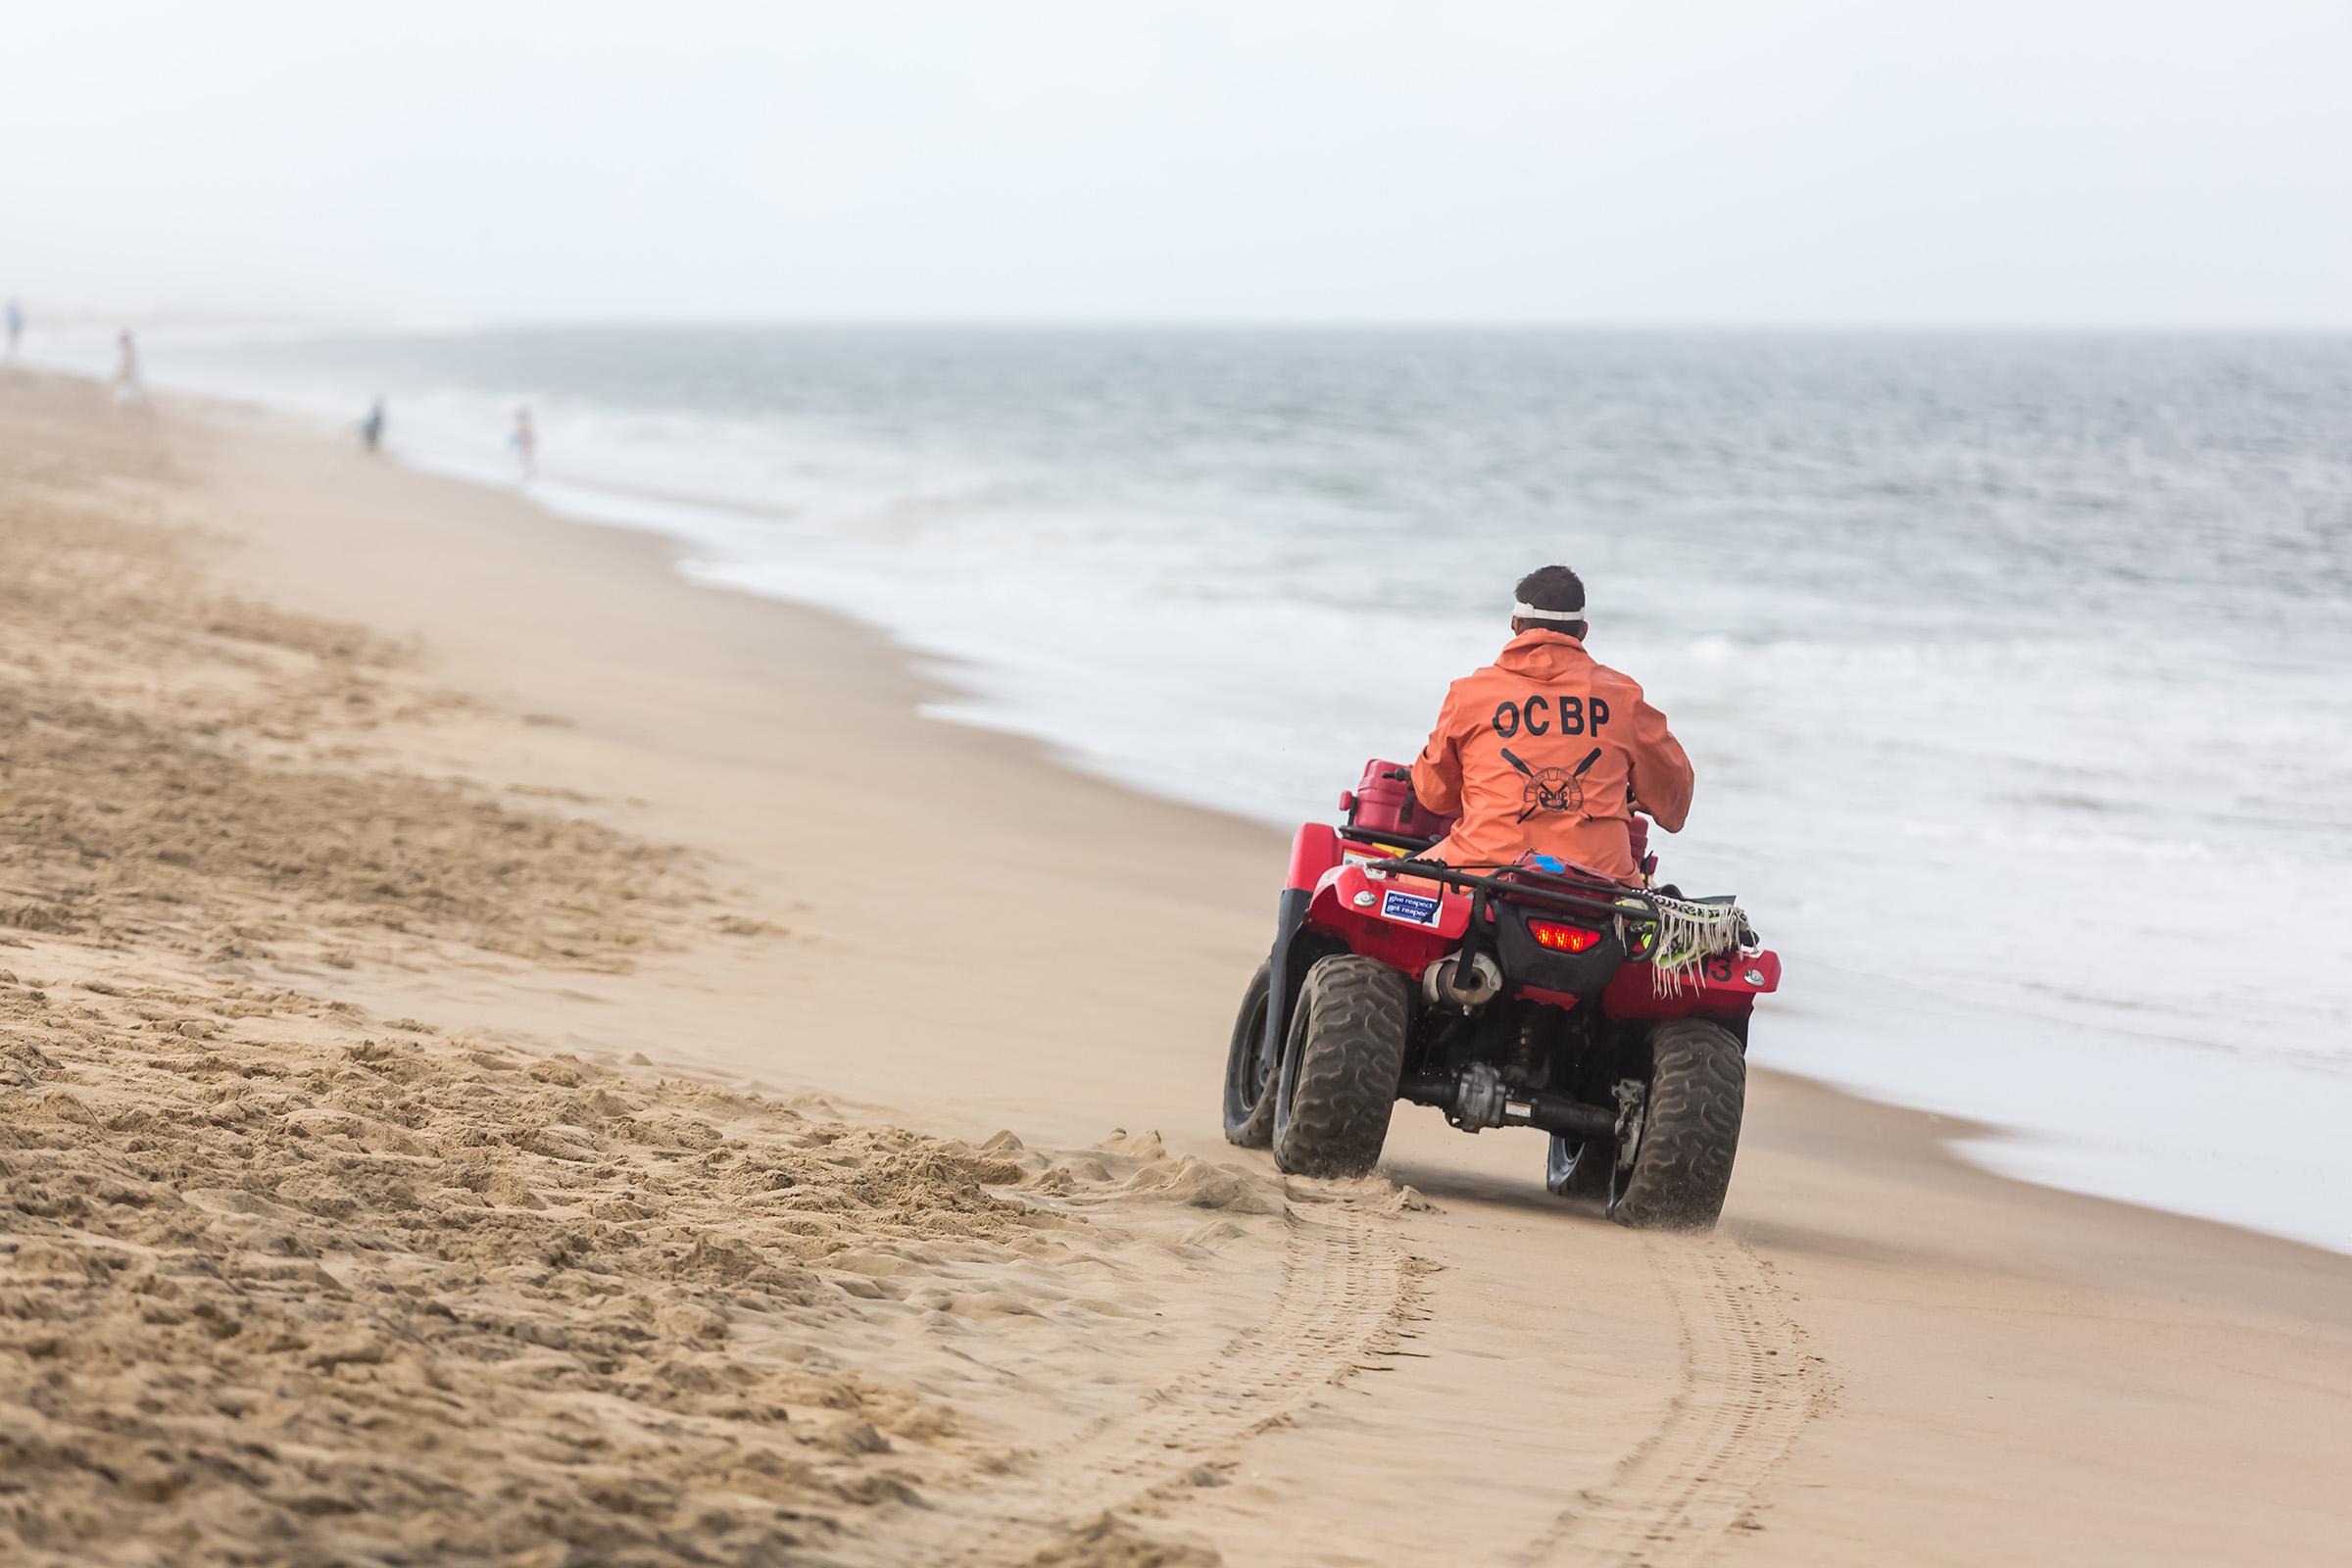 Reduced Beach Patrol Coverage In Effect In Ocean City